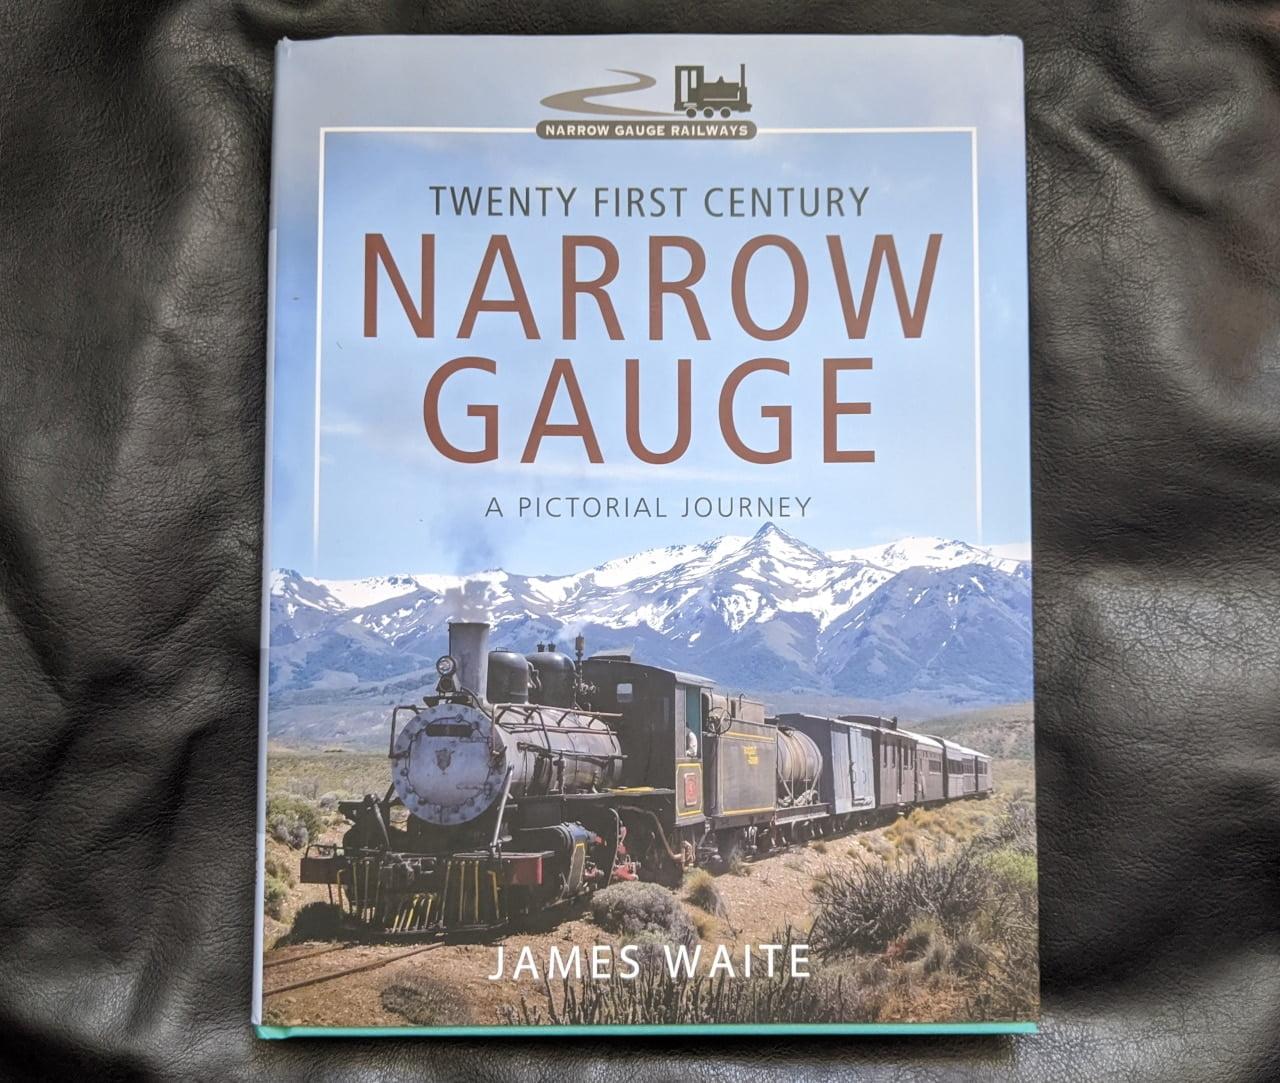 Twenty First Century Narrow Gauge - A Pictorial Journey